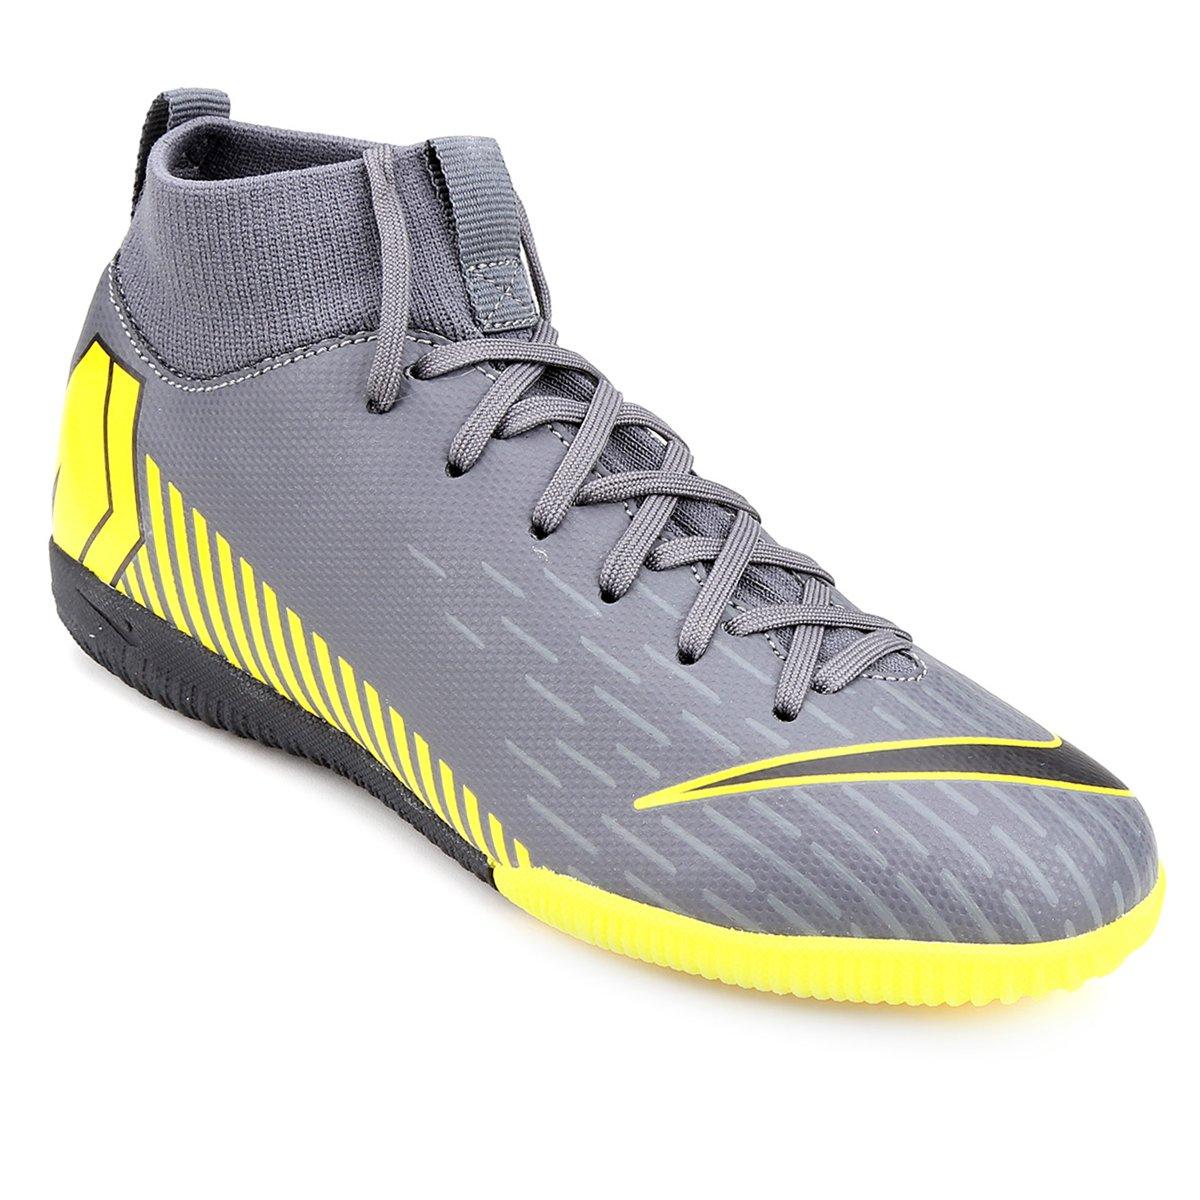 fdc816f497e Chuteira Futsal Infantil Nike Superfly 6 Academy Gs IC - Cinza - Compre  Agora